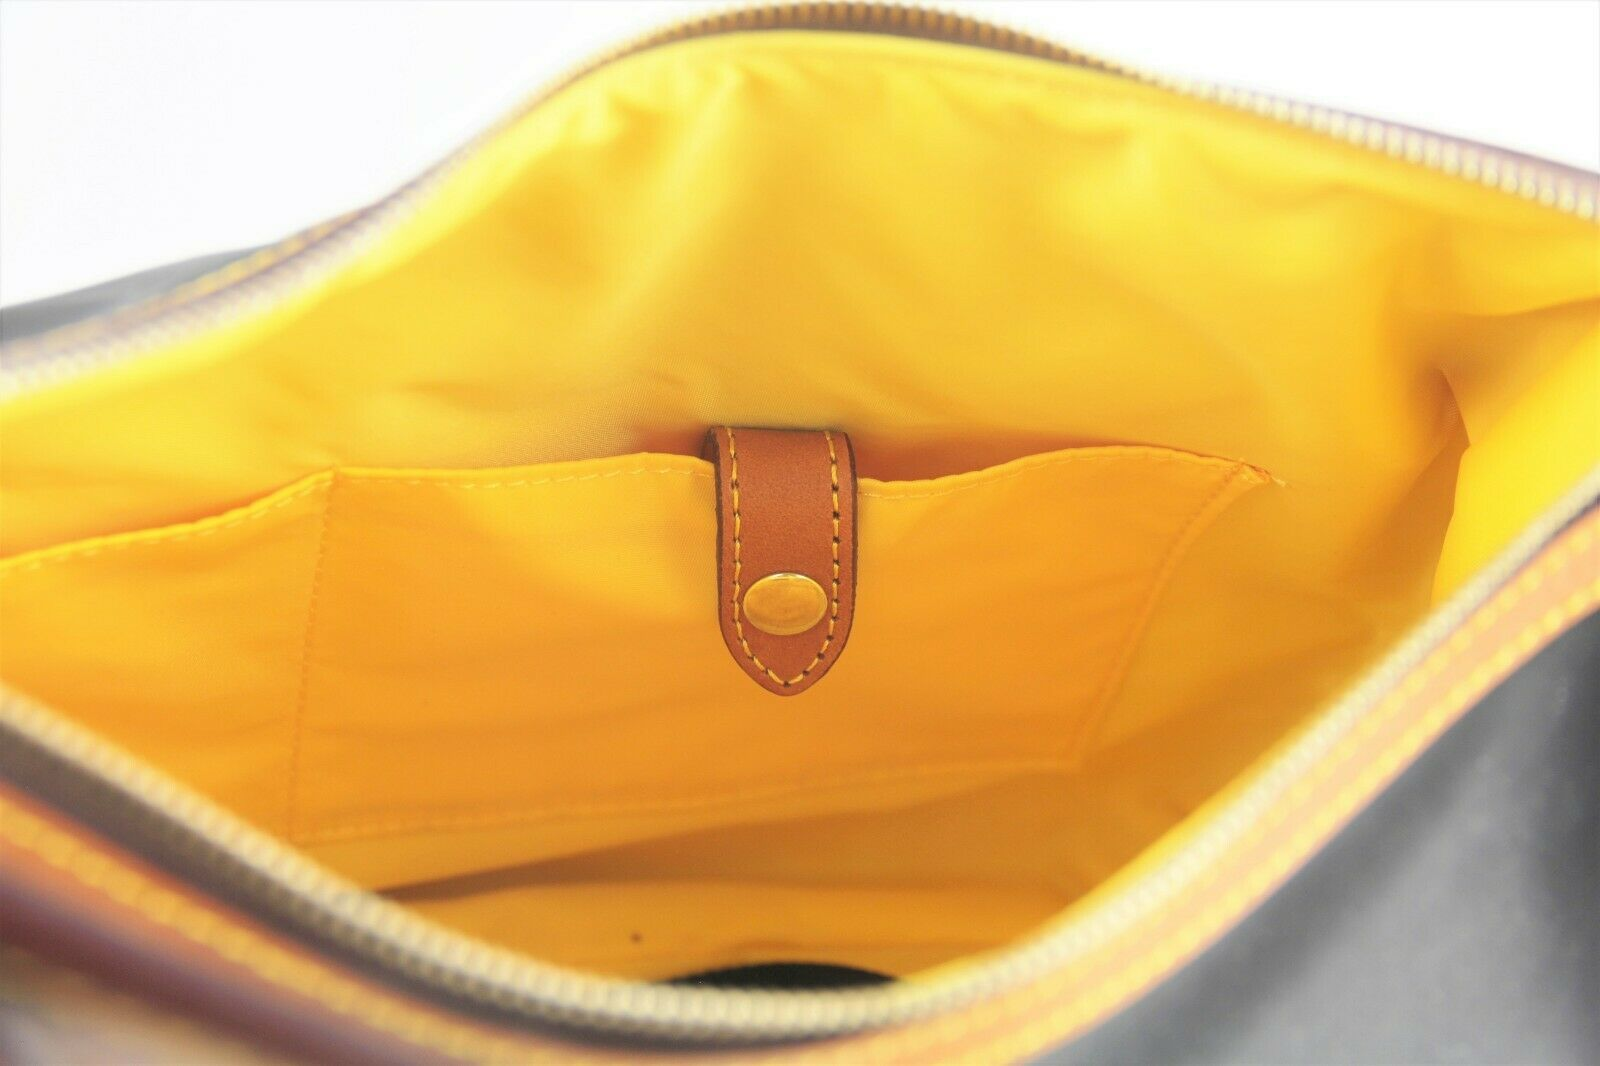 AUTHENTIC DOONEY & BOURKE NYLON LEATHER TRIM HOBO SHOULDER BAG PURSE HANDBAG